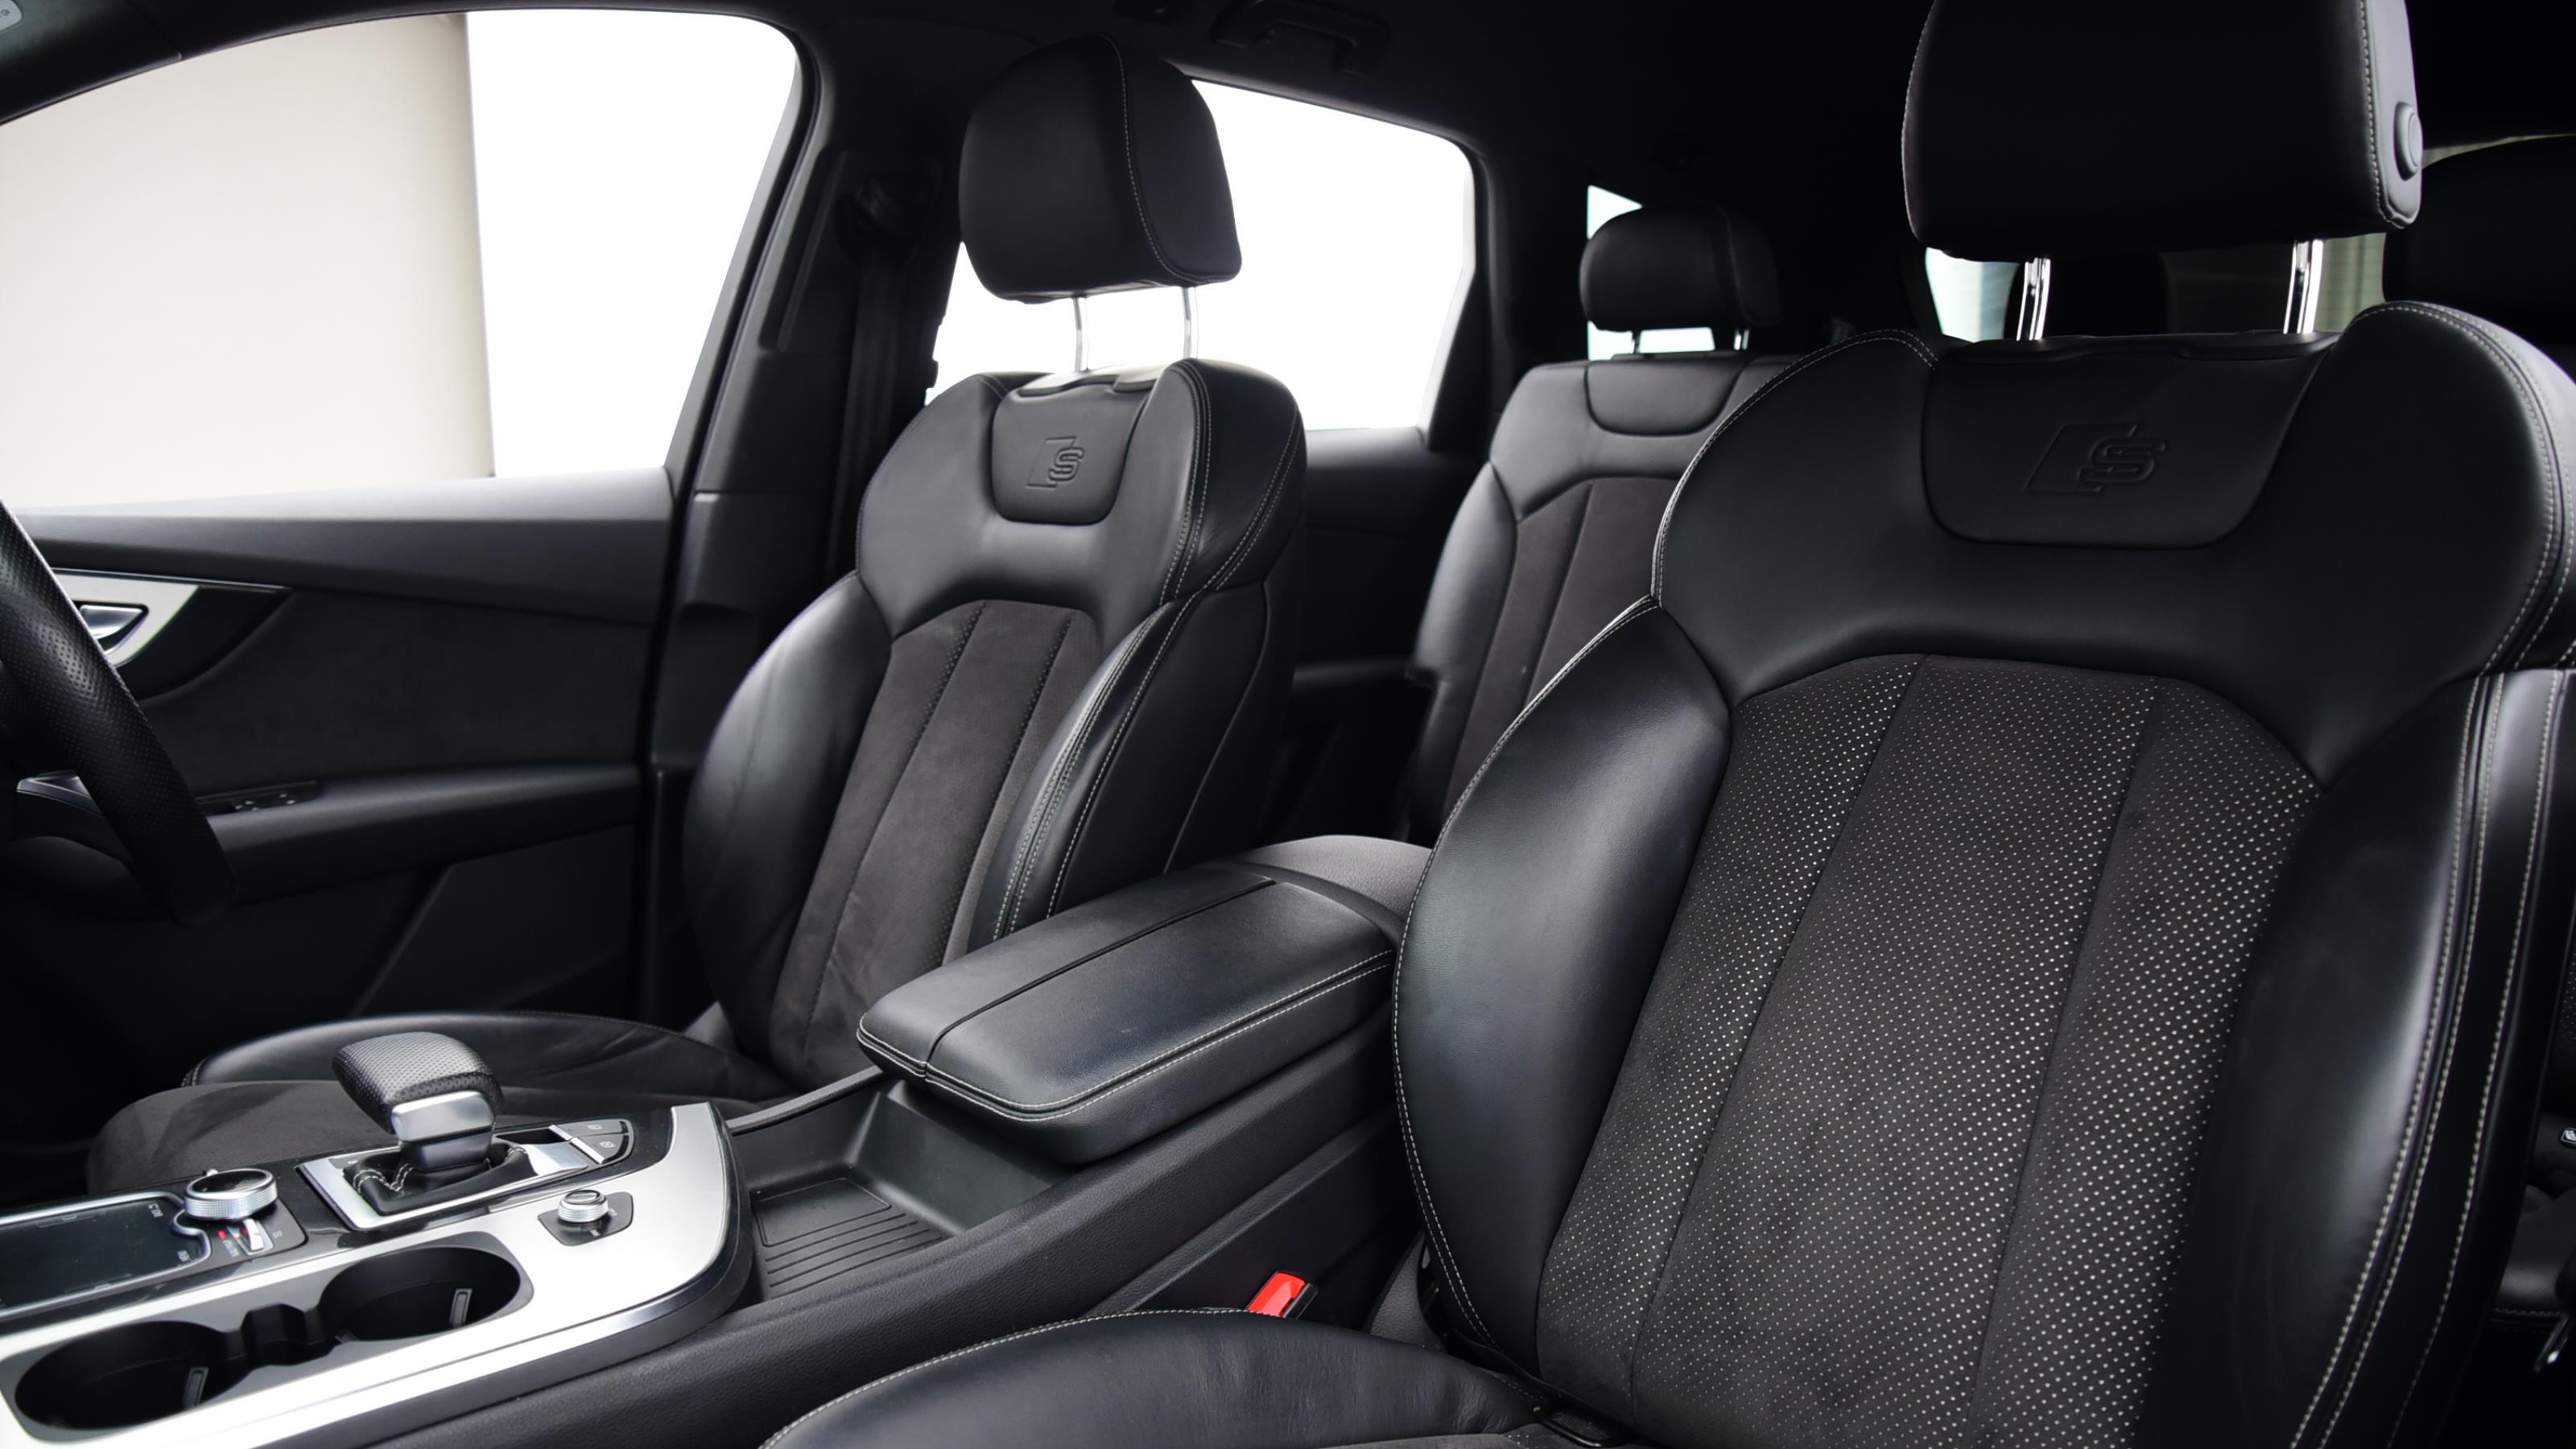 Used 2015 Audi Q7 3.0 TDI Quattro S Line 5dr Tip Auto BLACK at Saxton4x4